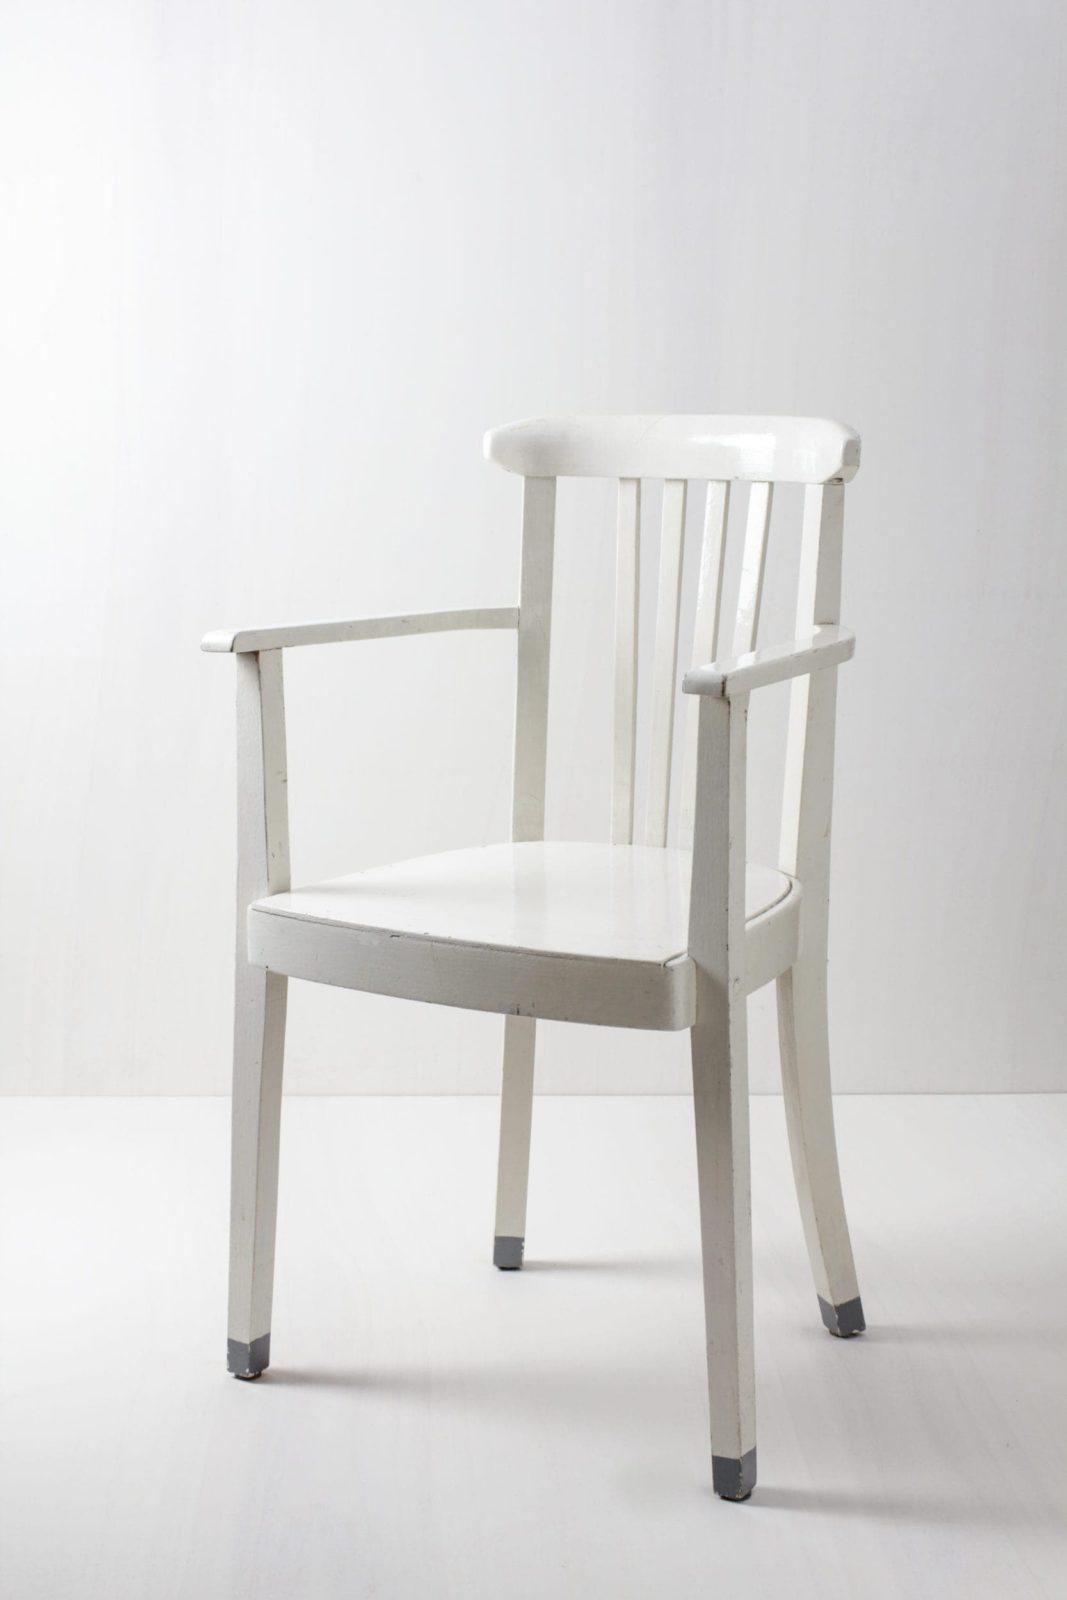 Armchair Josefa | Dining chair with nice patina and a high backrest. Frankfurt chair, Viennese avant-garde style. | gotvintage Rental & Event Design